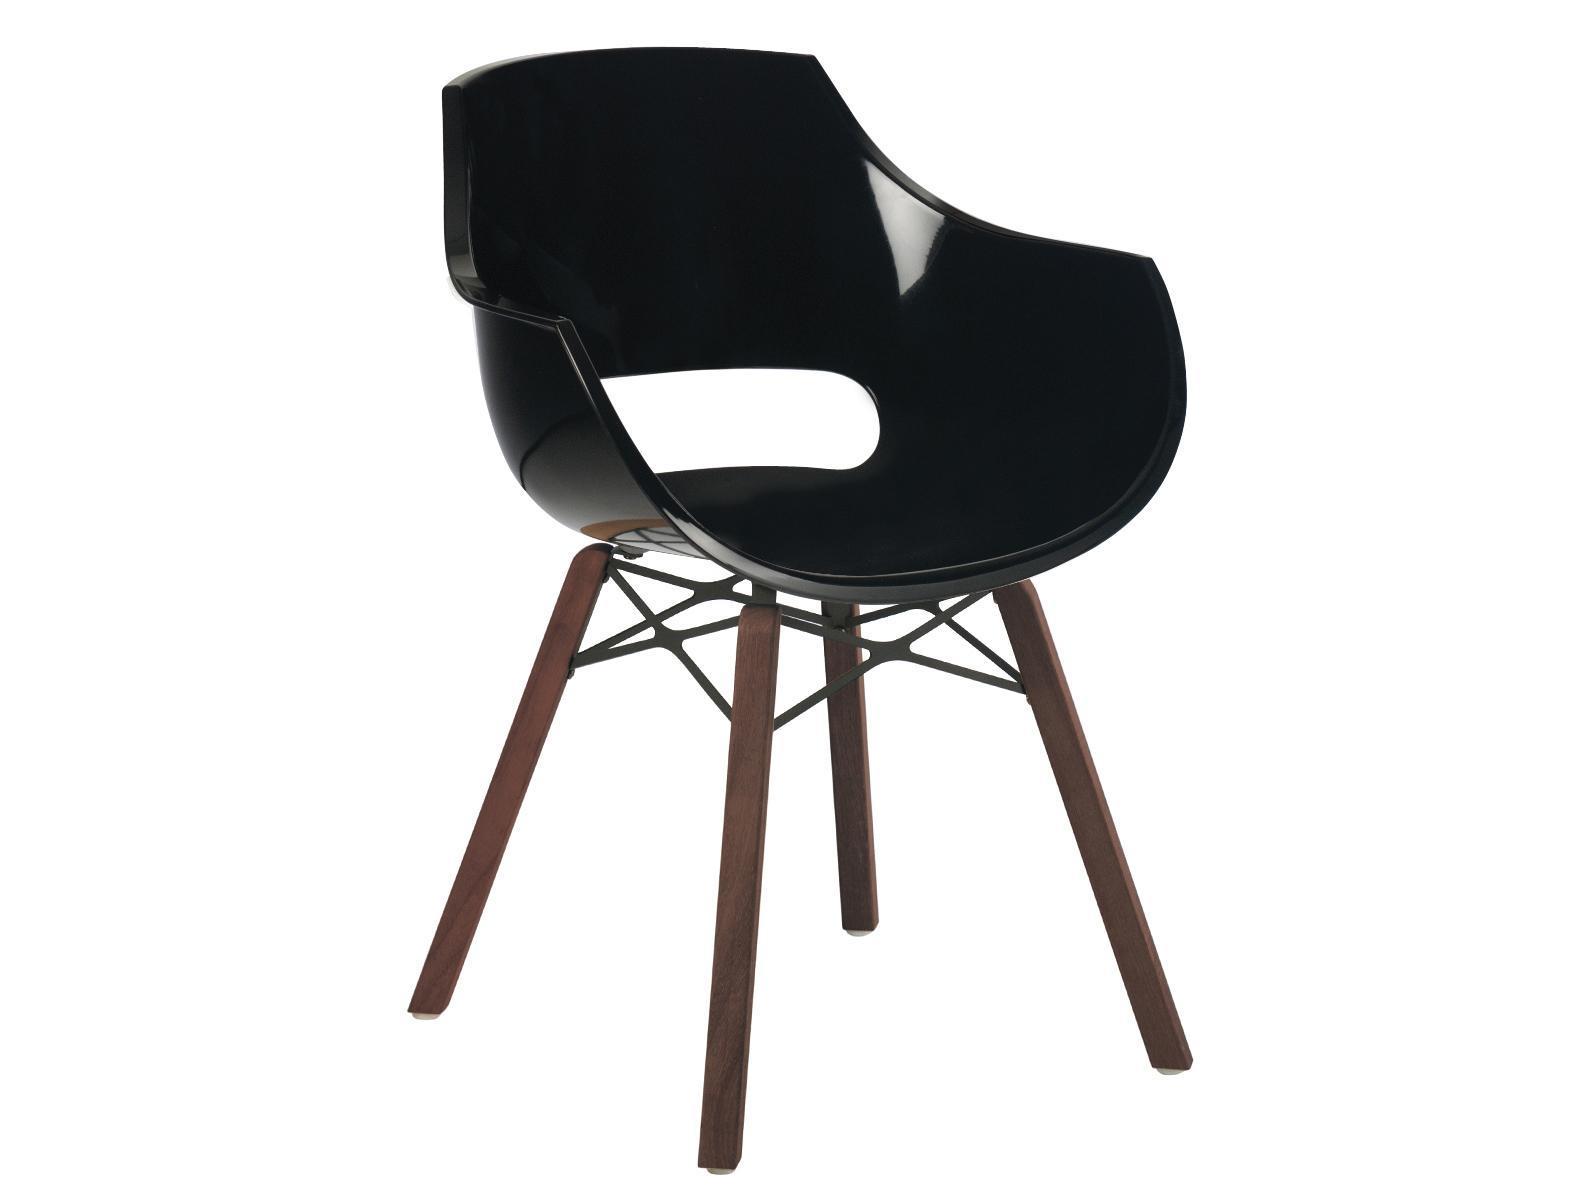 Кресло пластиковое Opal Wox Iroko